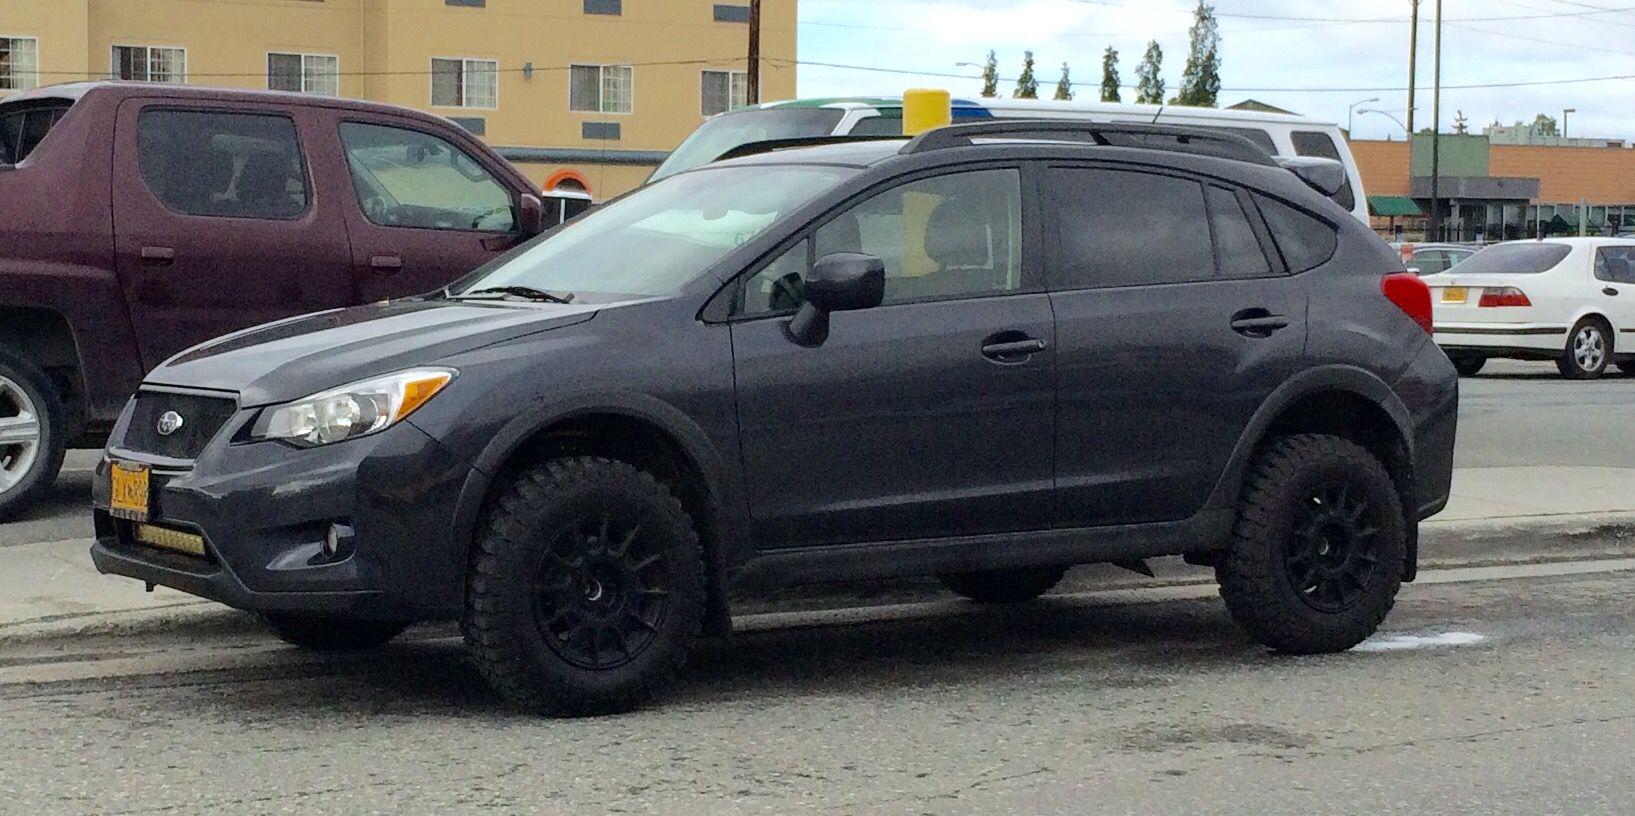 Subaru Crosstrek Sti Wheels >> Crosstrek Method Rally Wheel Recherche Google Car Ideas